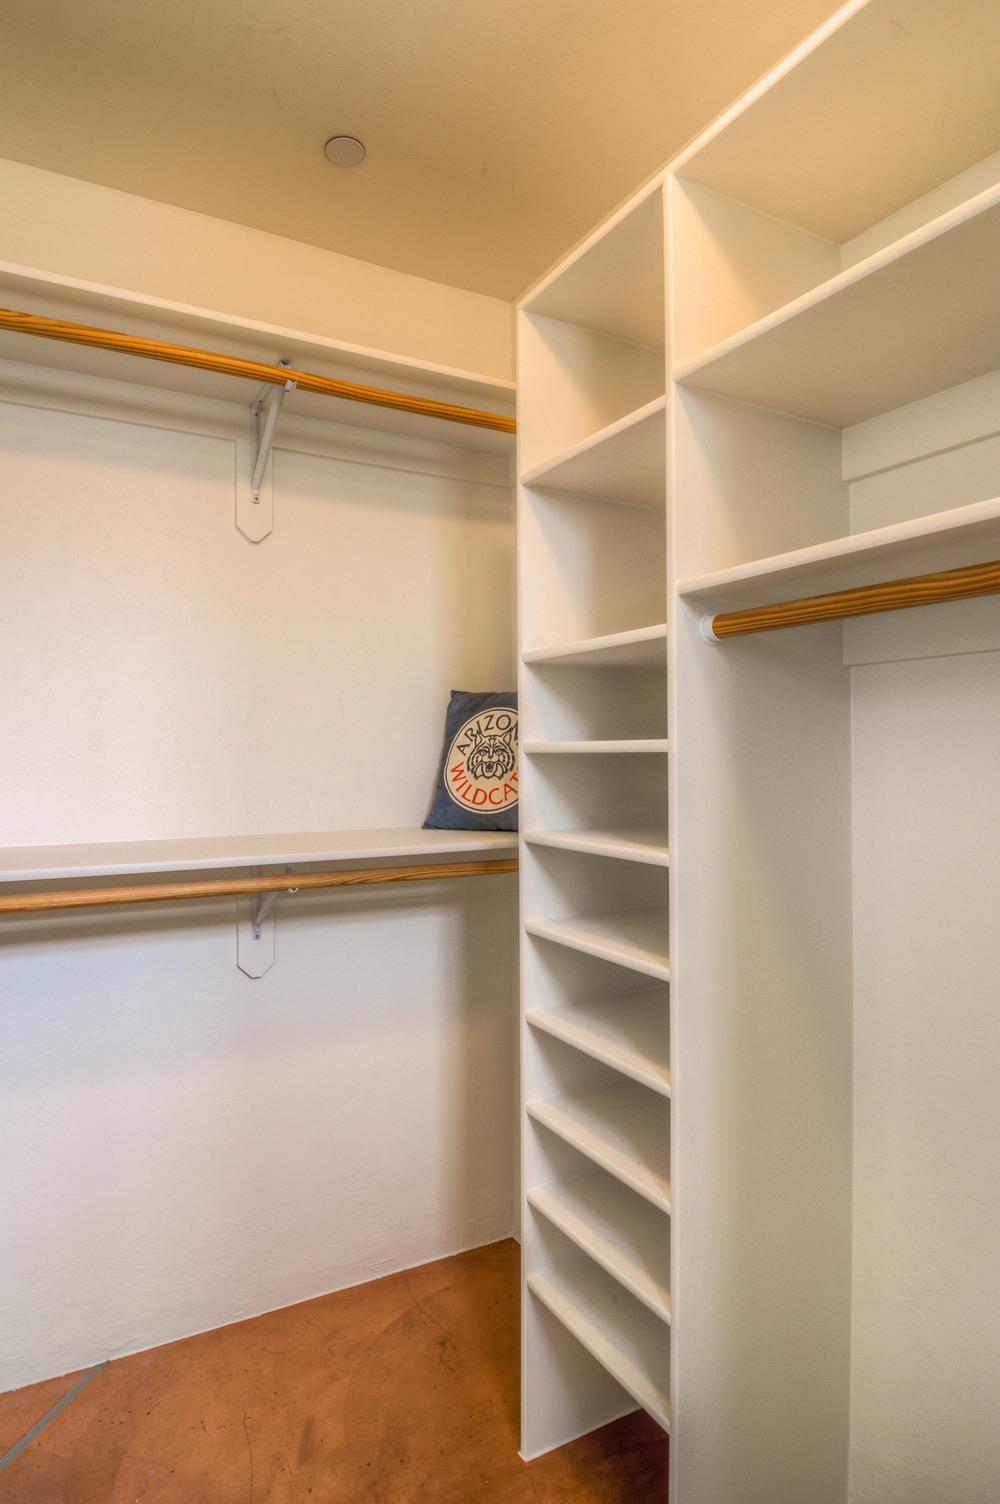 13 Bedroom Closet.jpg